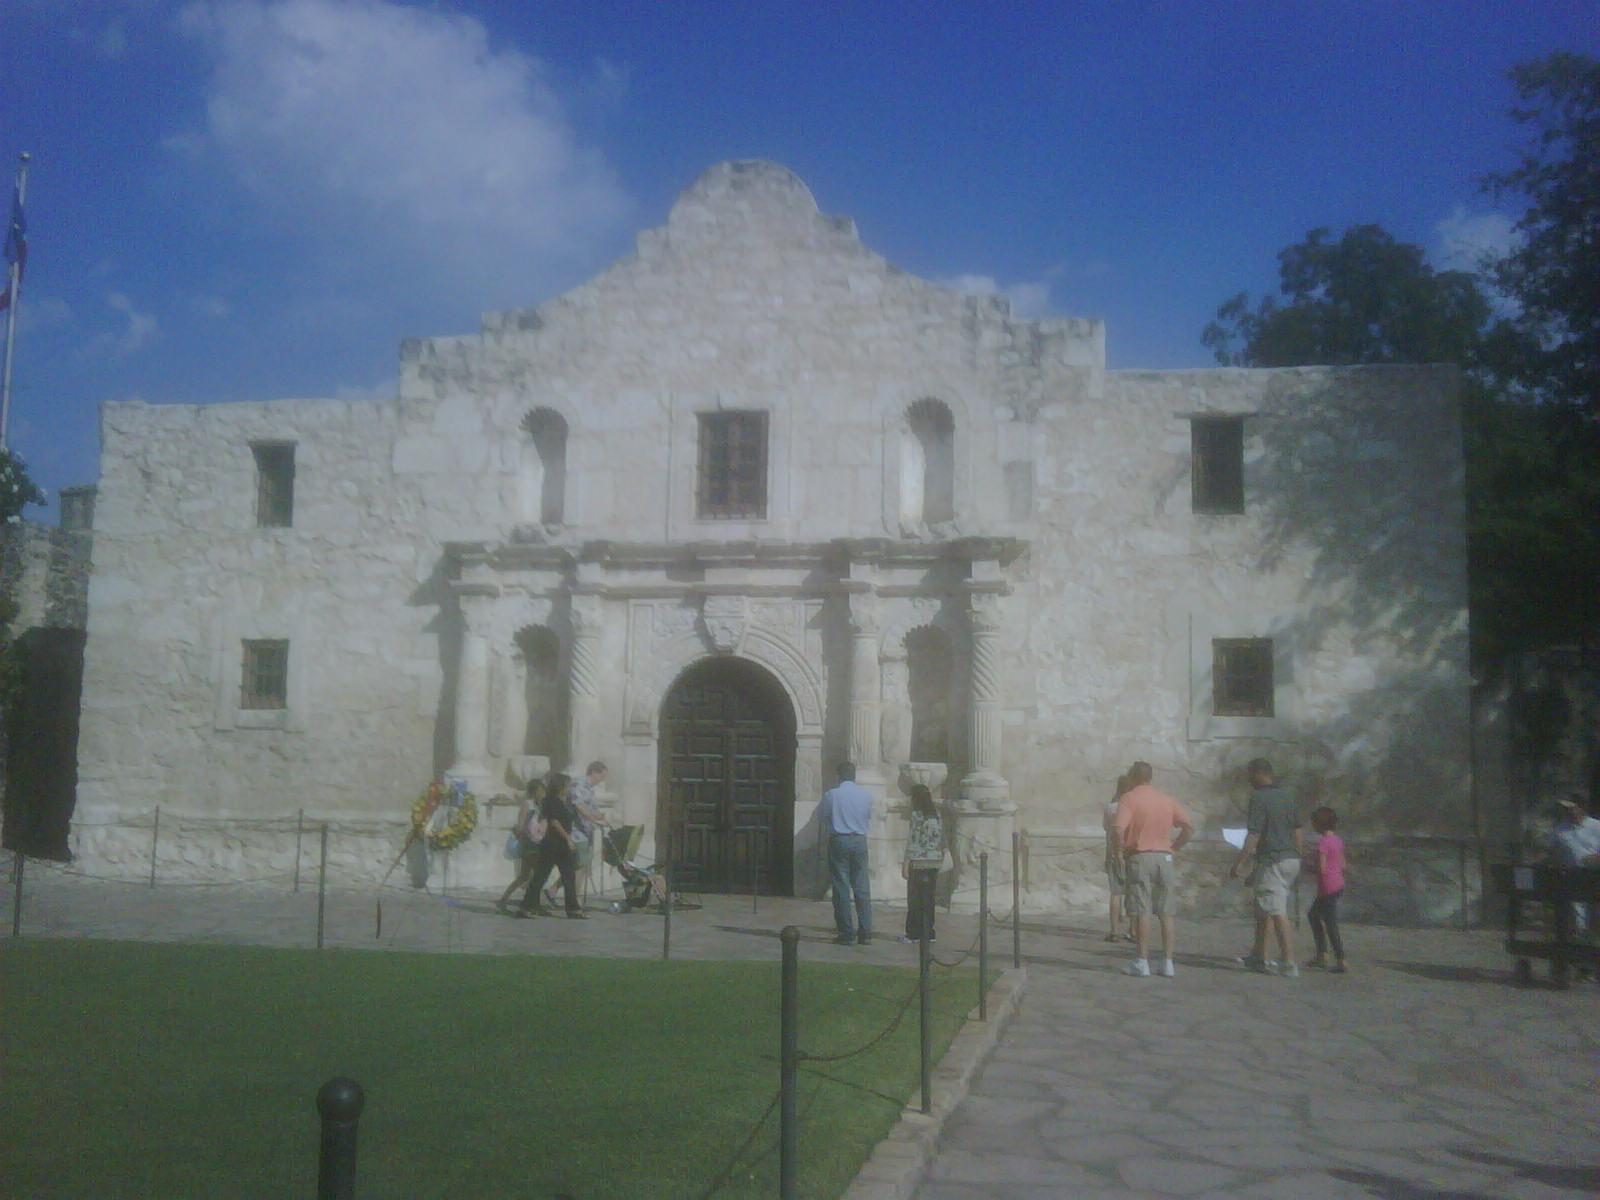 Jon Arnolds yst 2 0 Blog  Semi Random Thoughts on Texas  the